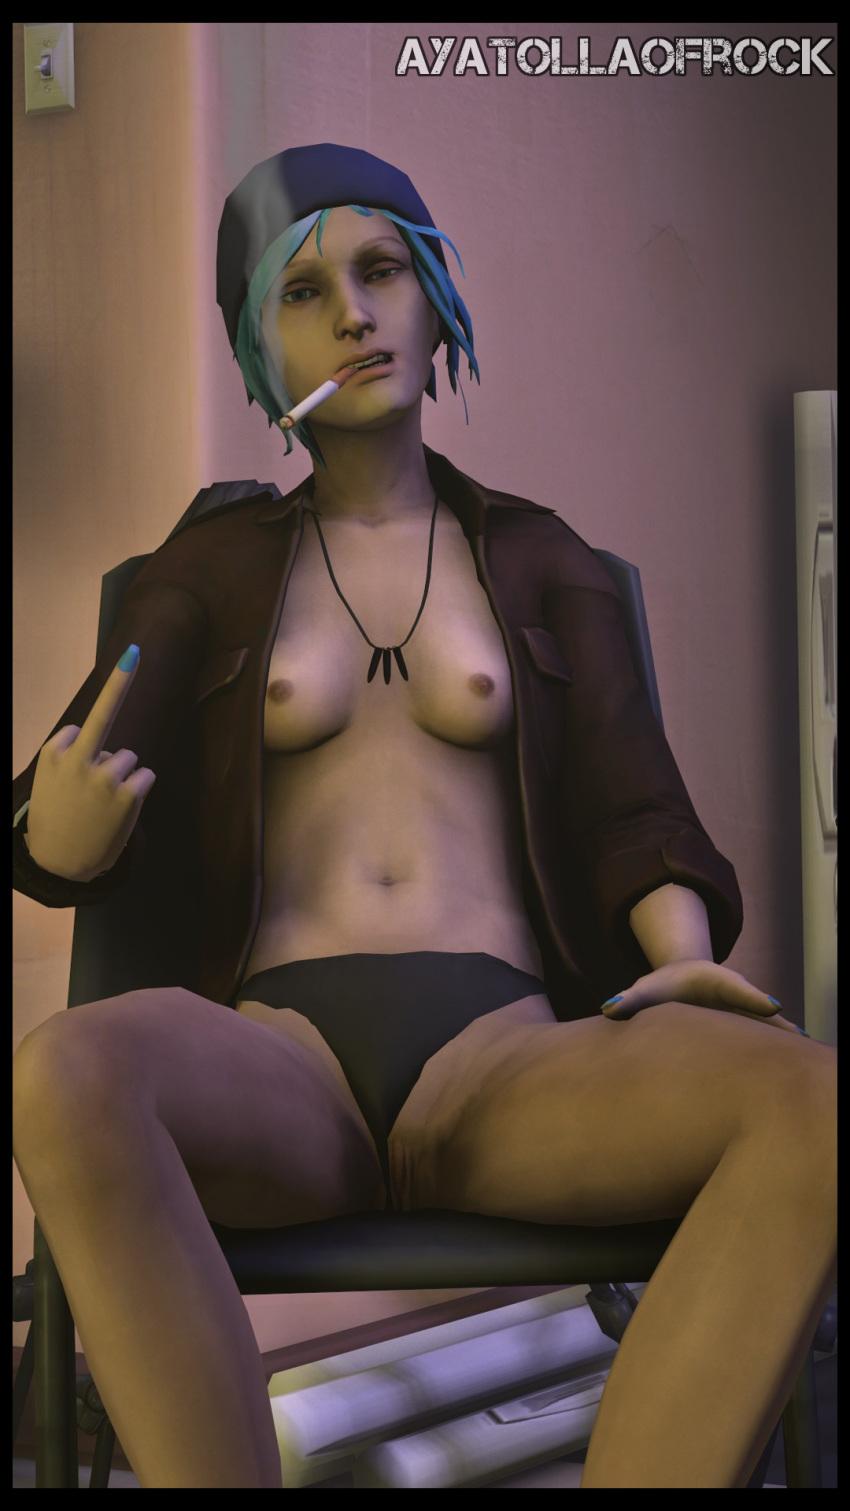 madsen life david strange is Mass effect andromeda cora naked